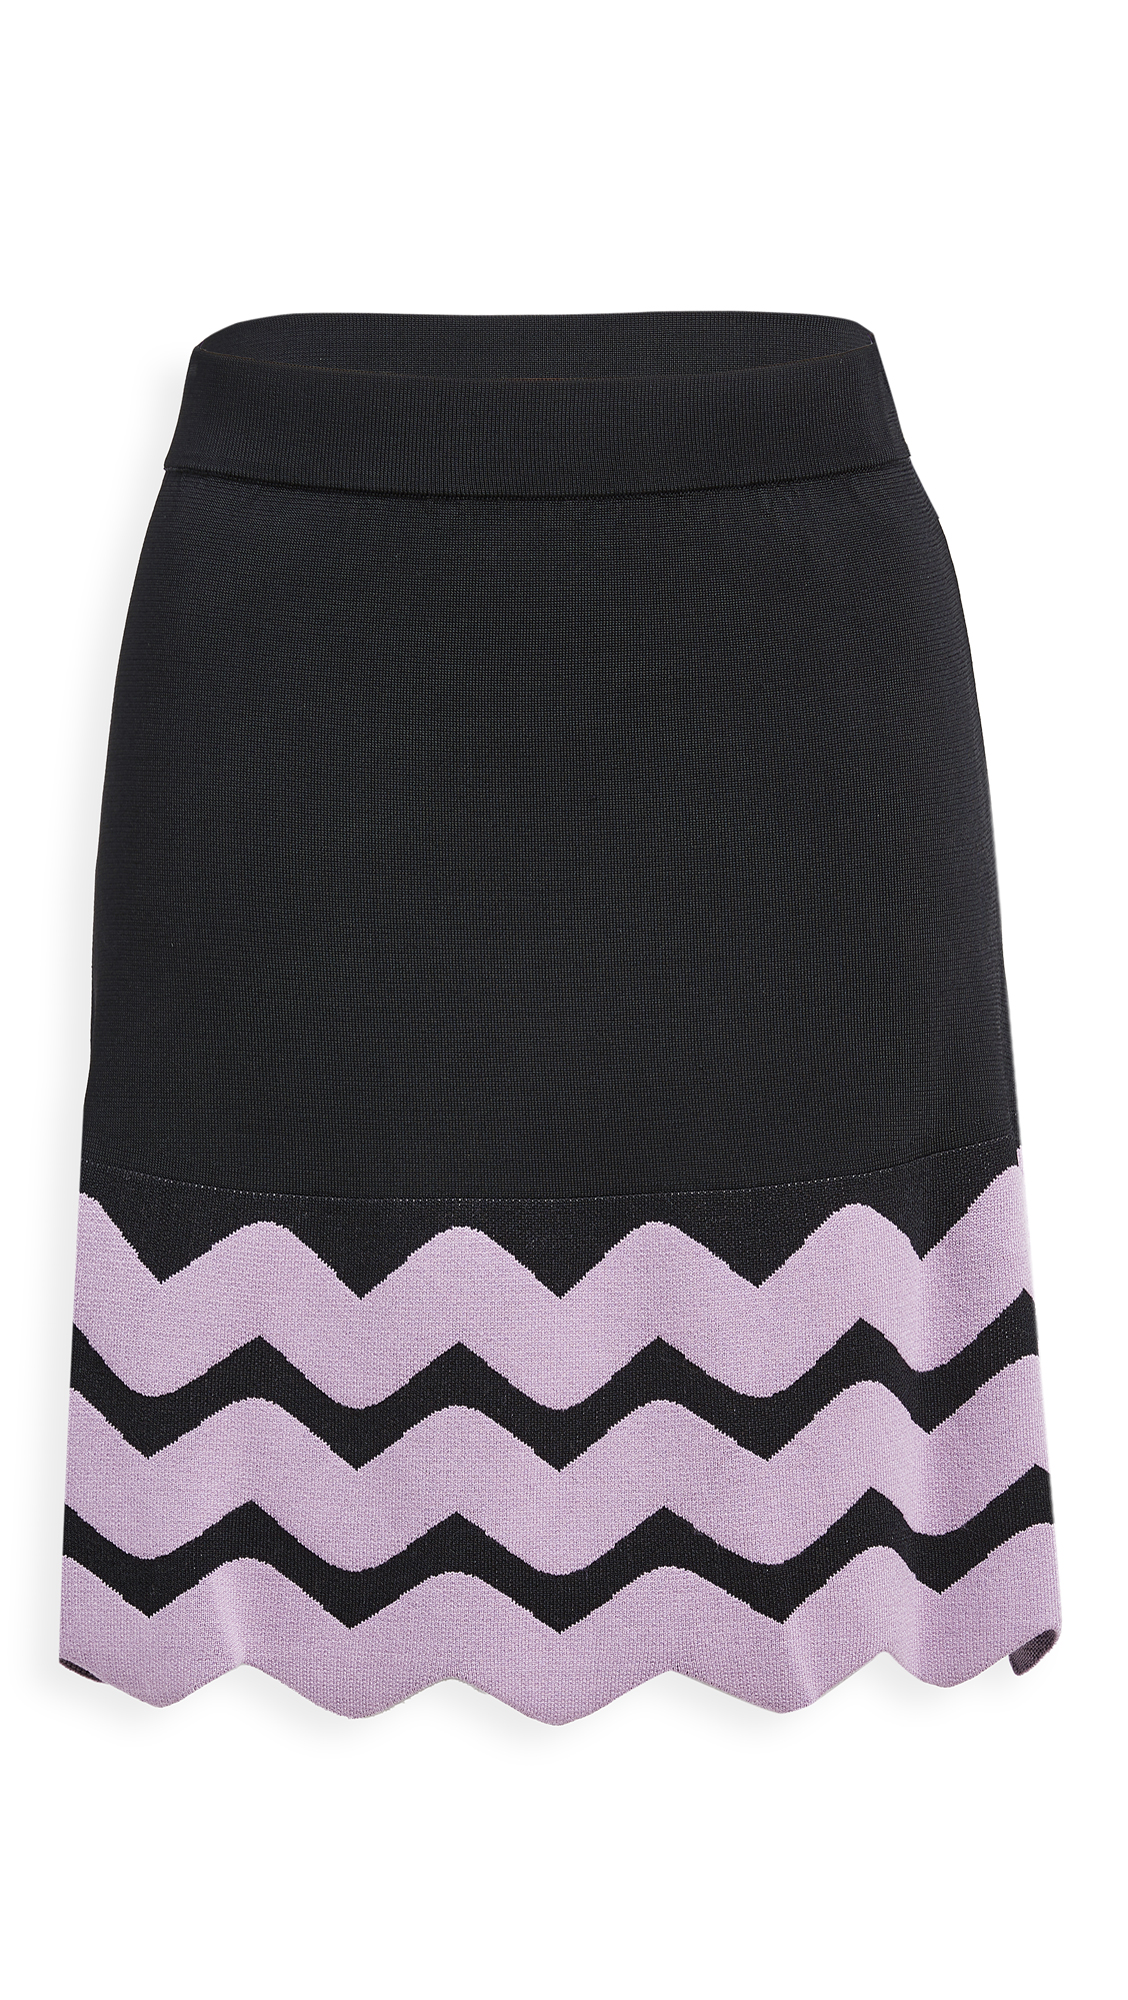 JoosTricot Keyhole Miniskirt with Ribbon Edge Hem